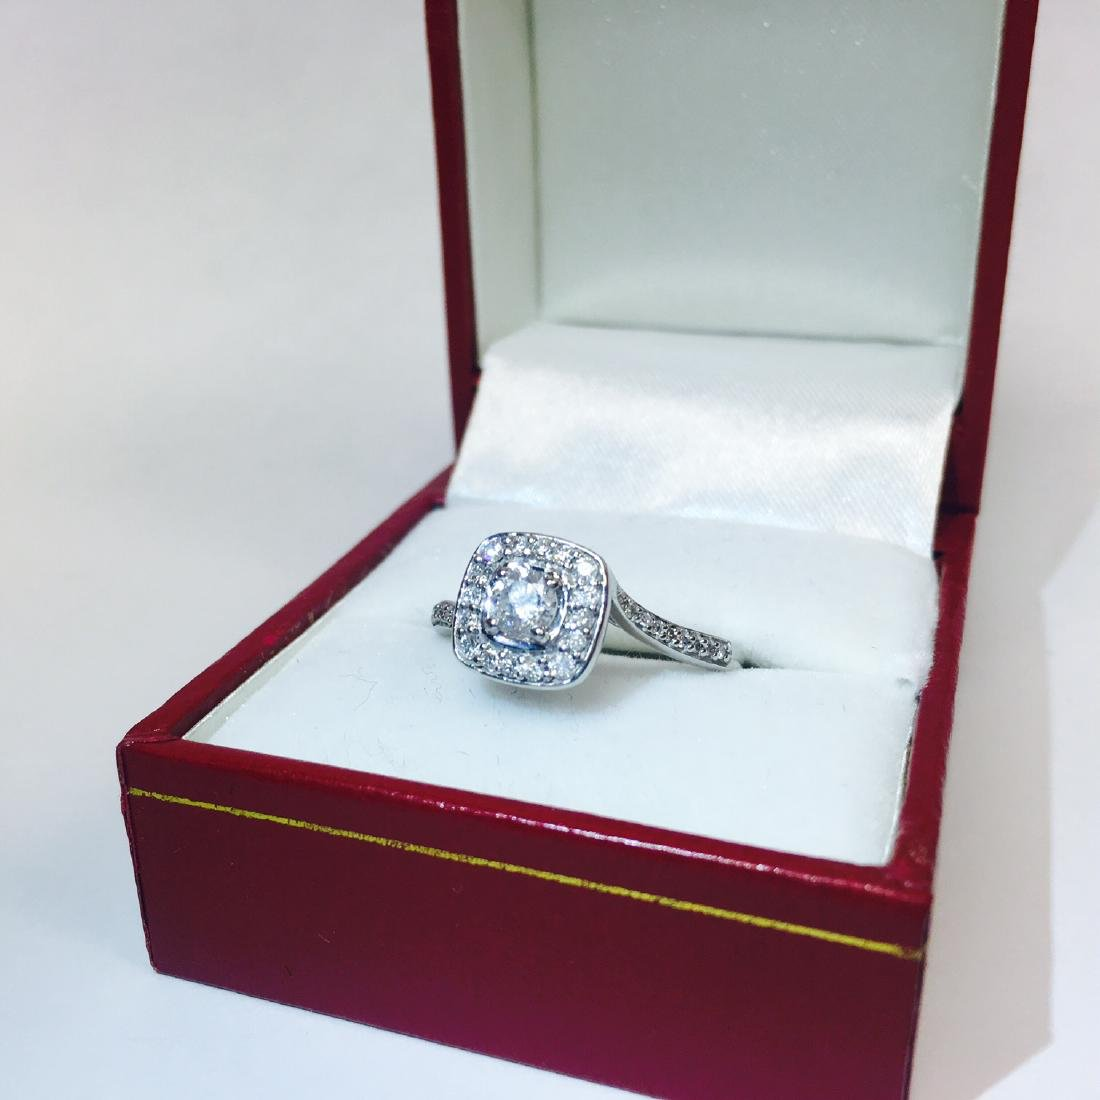 14K White Gold, VS 0.75 Carat Diamond Ring - 4